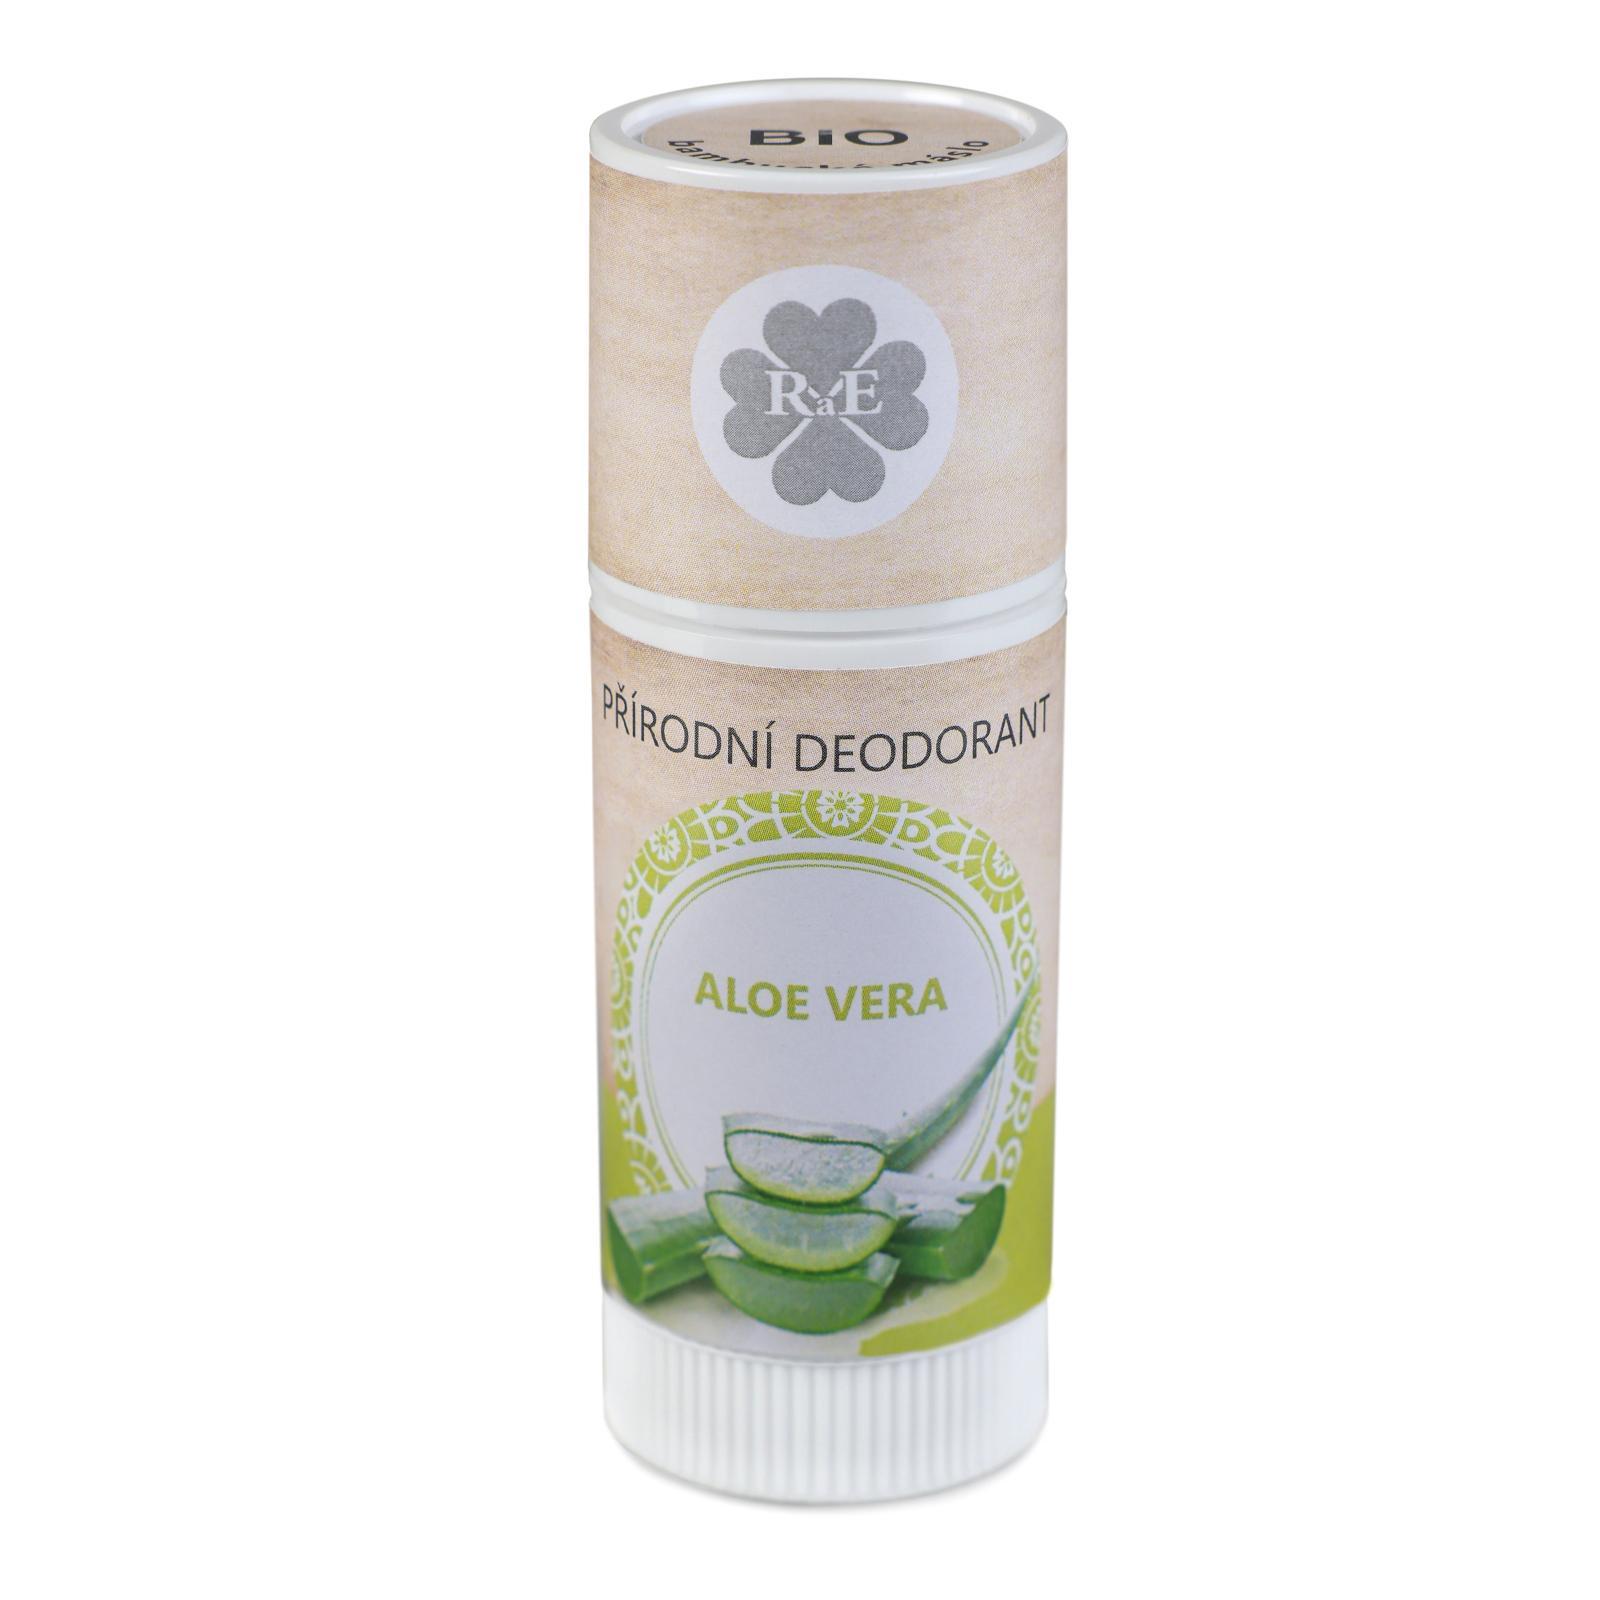 RaE Přírodní deodorant s vůní Aloe vera 25 ml